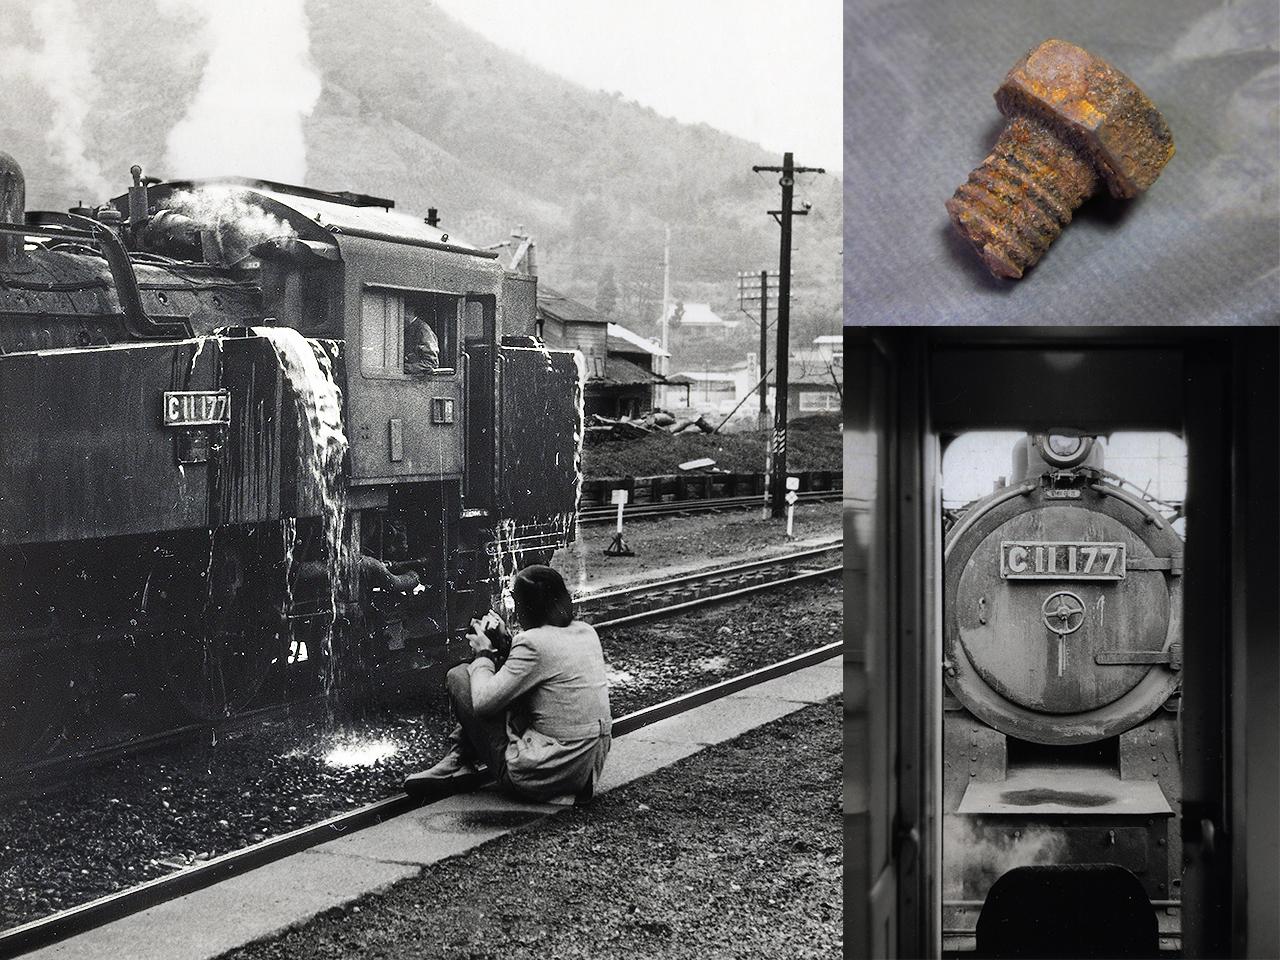 http://moritetsu.info/train/img/w01-c11-bolt02sssss.jpg